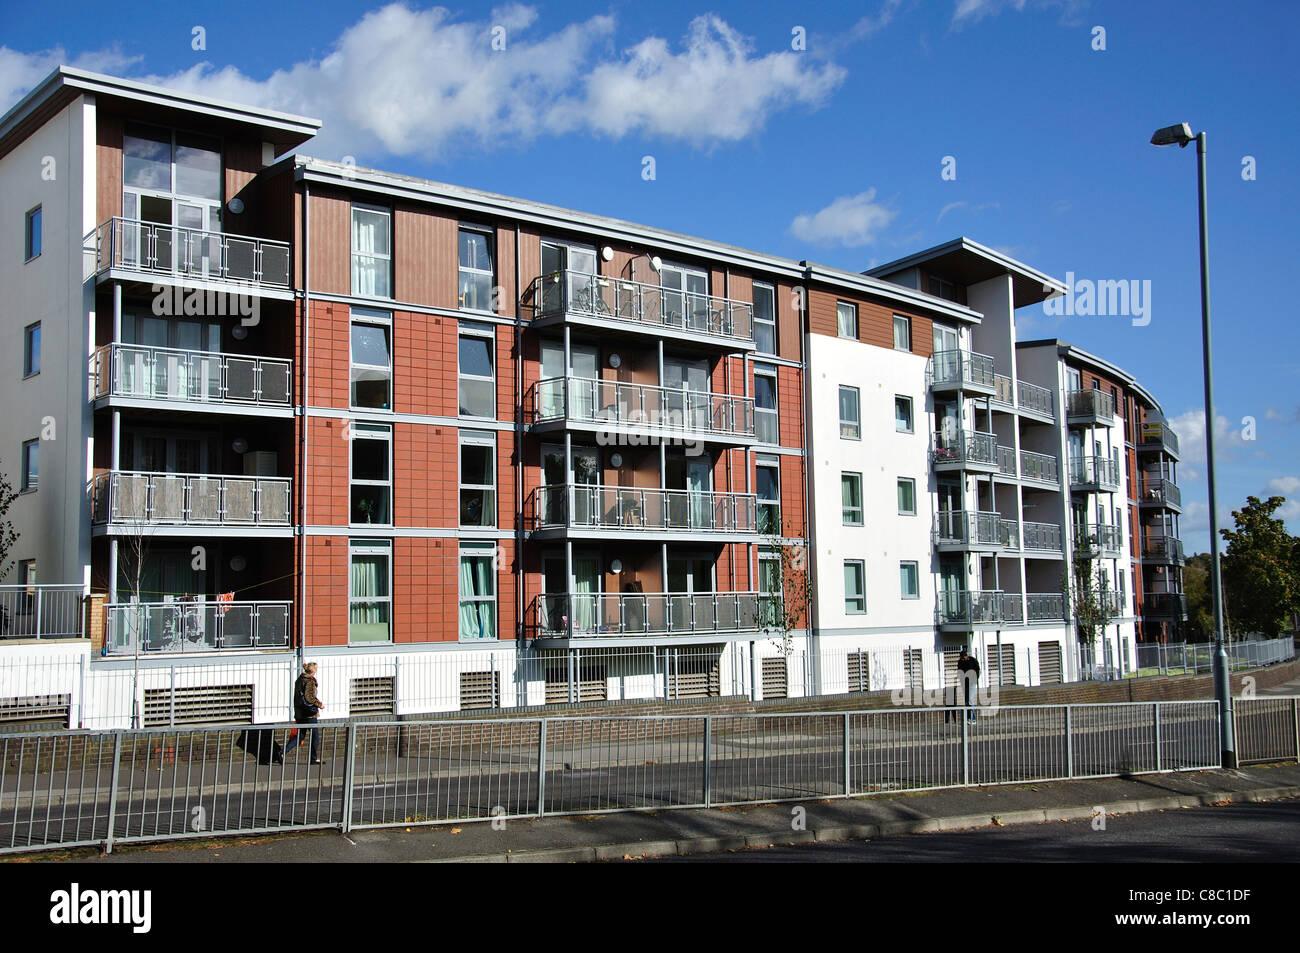 https://c8.alamy.com/comp/C8C1DF/modern-apartment-buildings-on-london-road-bracknell-berkshire-england-C8C1DF.jpg